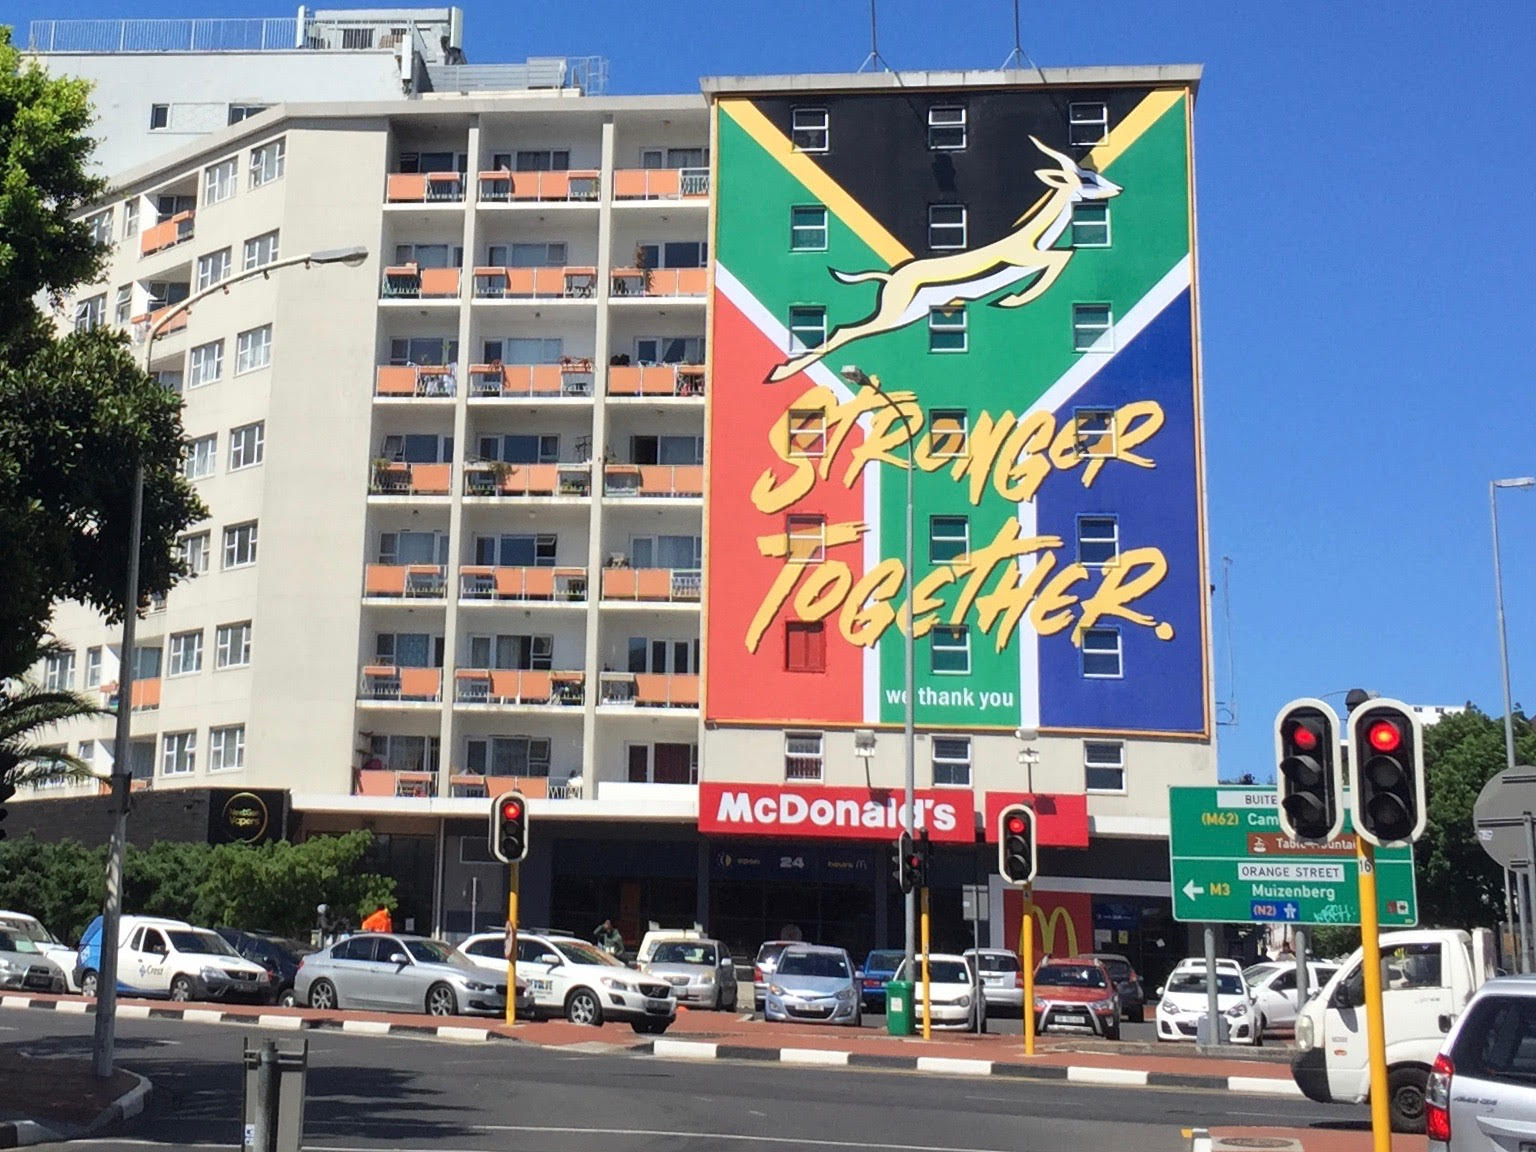 Cape Town: Hauswand als Werbefläche voll ausgenützt